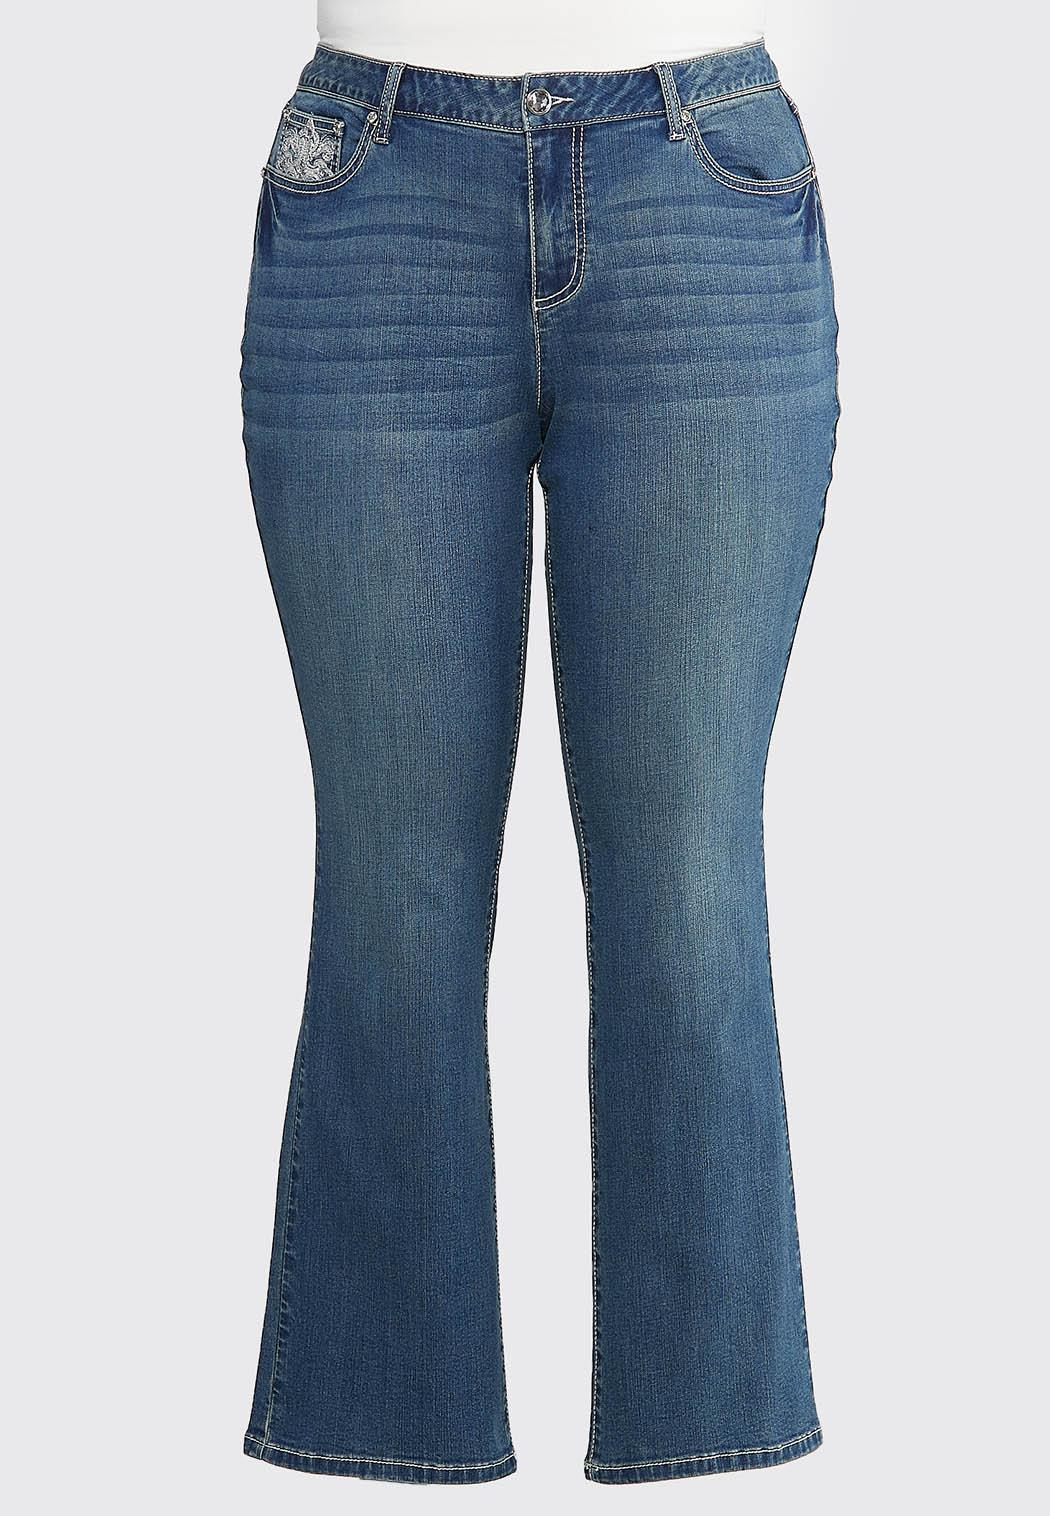 Plus Size Burst of Bling Bootcut Jeans (Item #44026119)